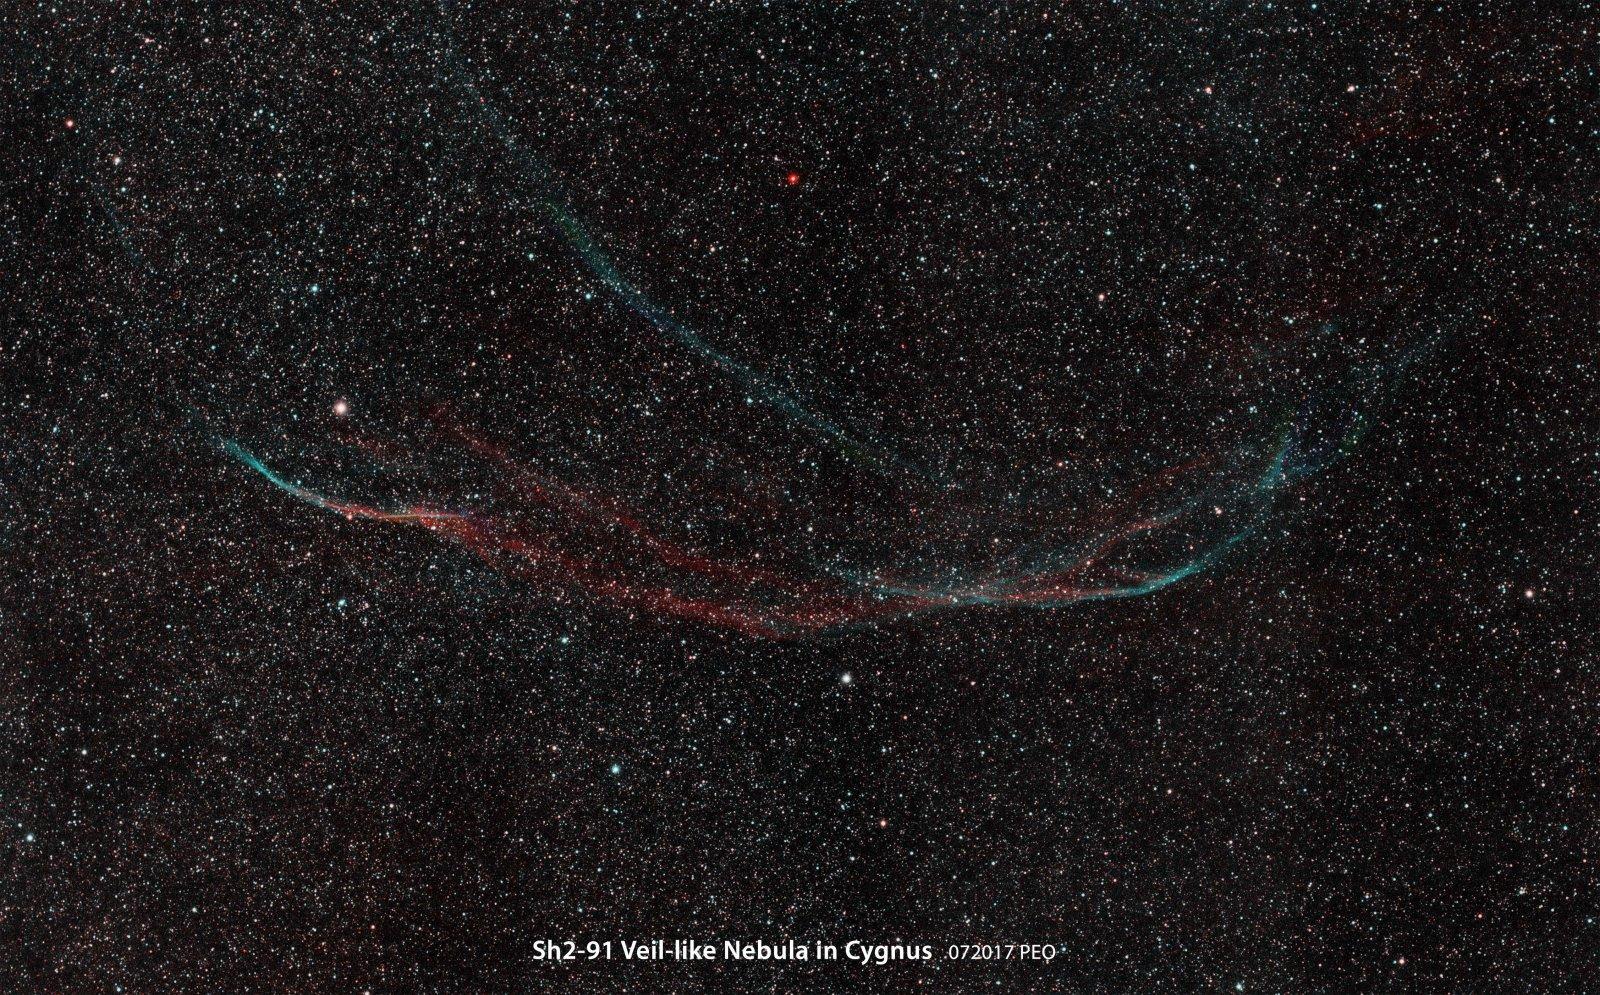 Second Veil Nebula in Cygnus